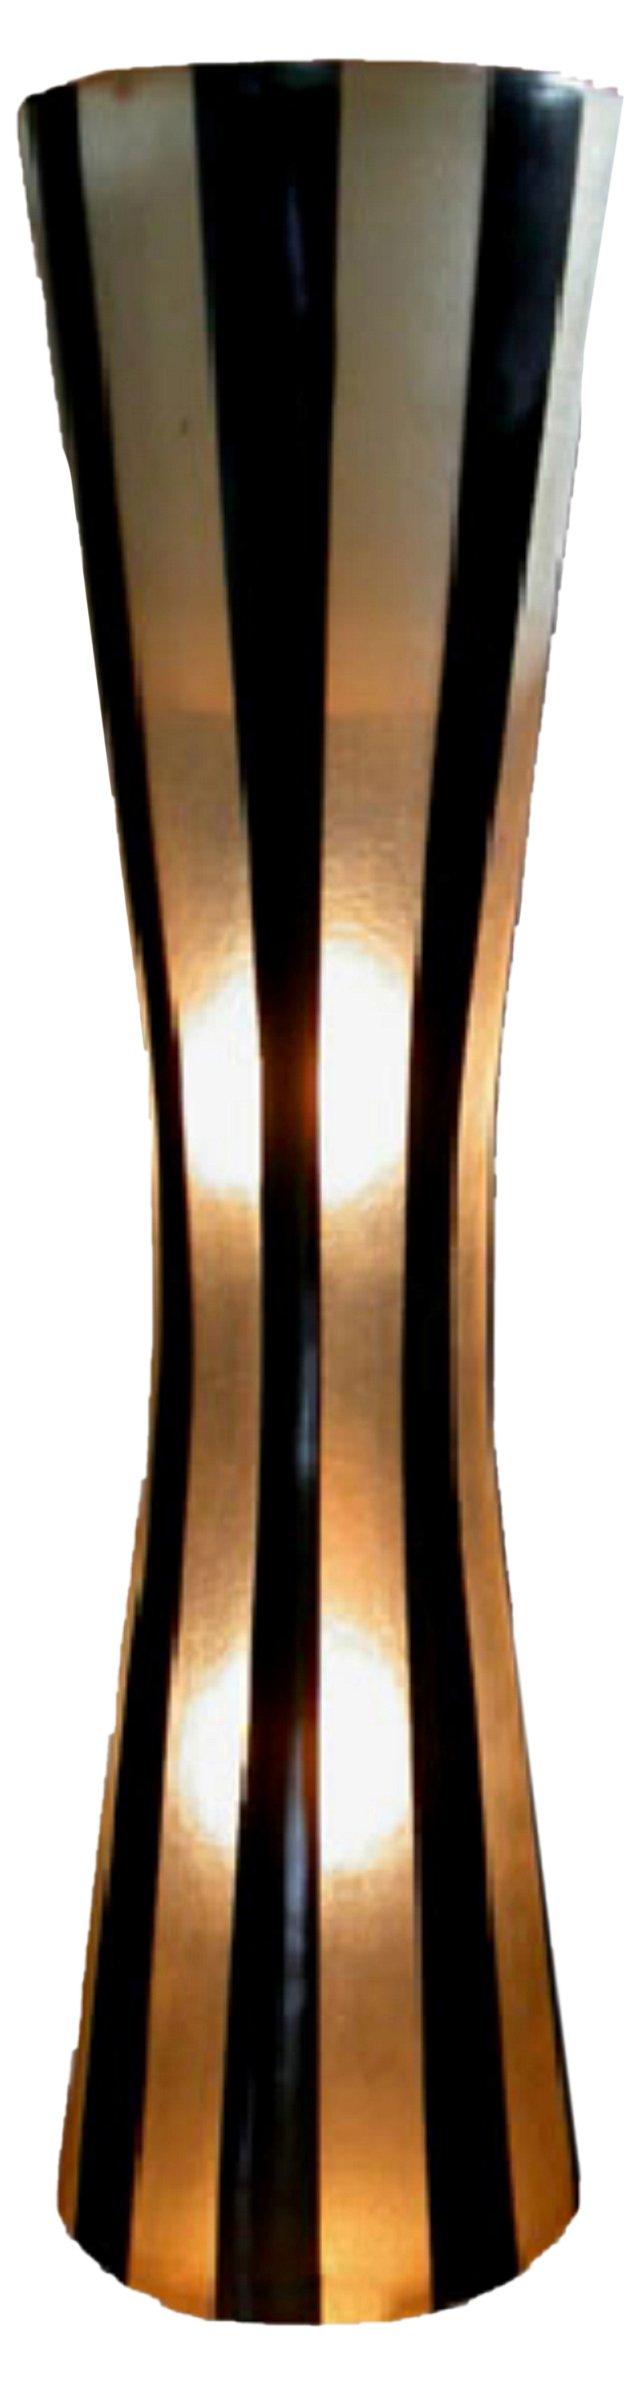 Artistry Jeriko Floor Lamp